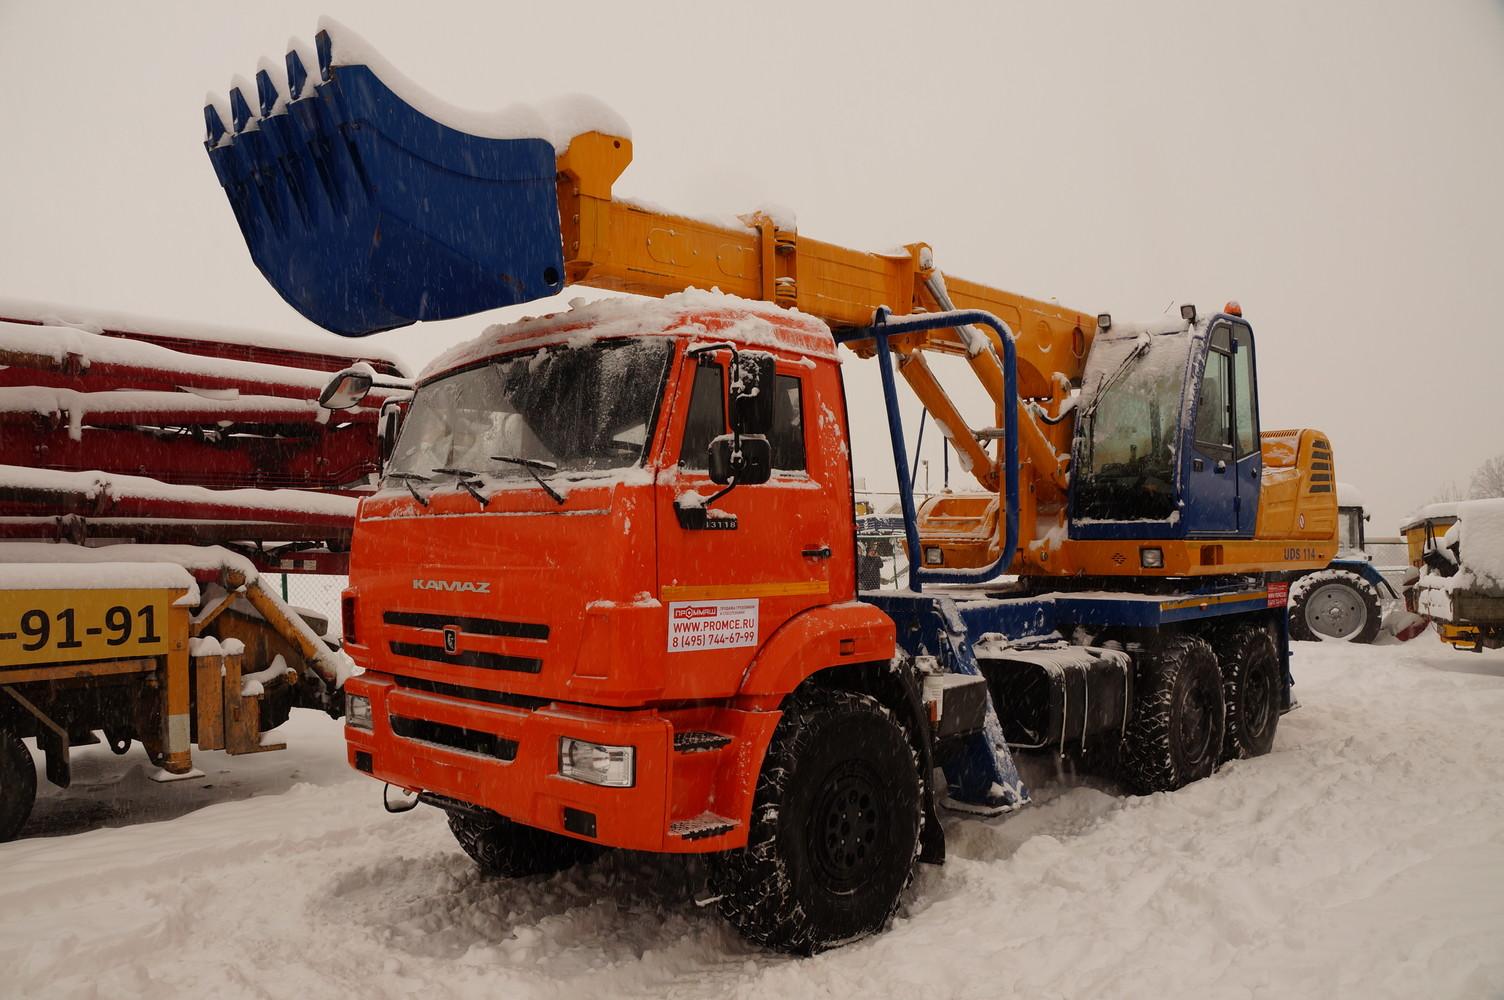 UDS 114 на шасси КамАЗ-43118 - Экскаватор-планировщик